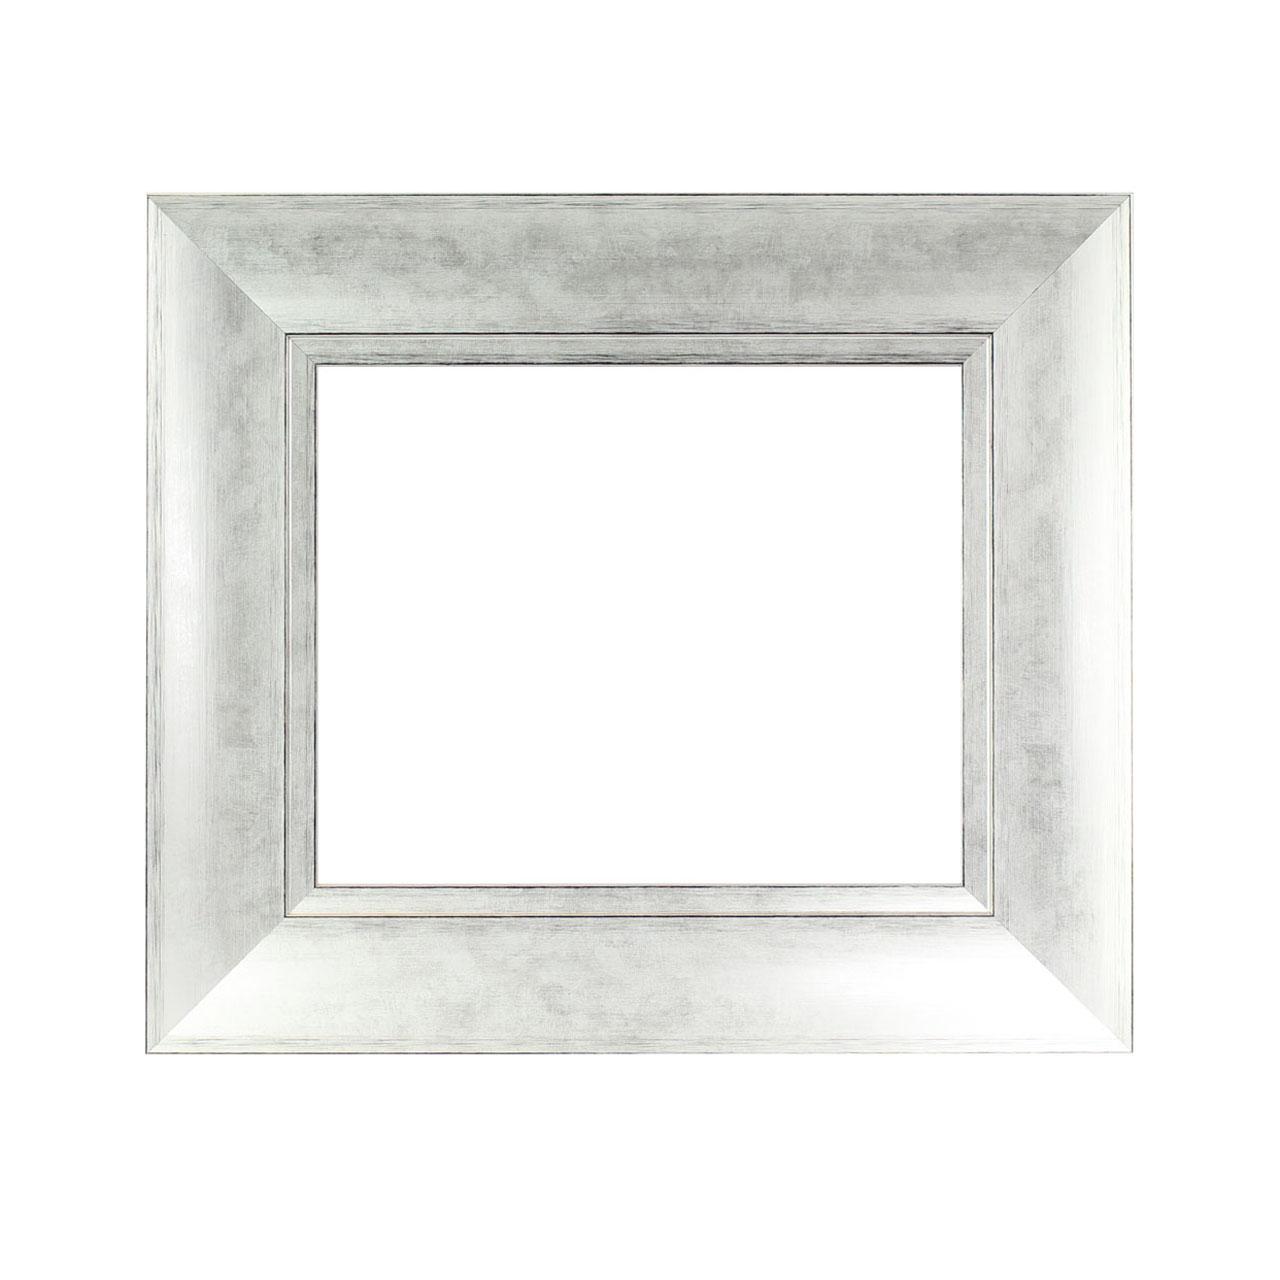 galva argent cadre pour tableau cadres en stock. Black Bedroom Furniture Sets. Home Design Ideas